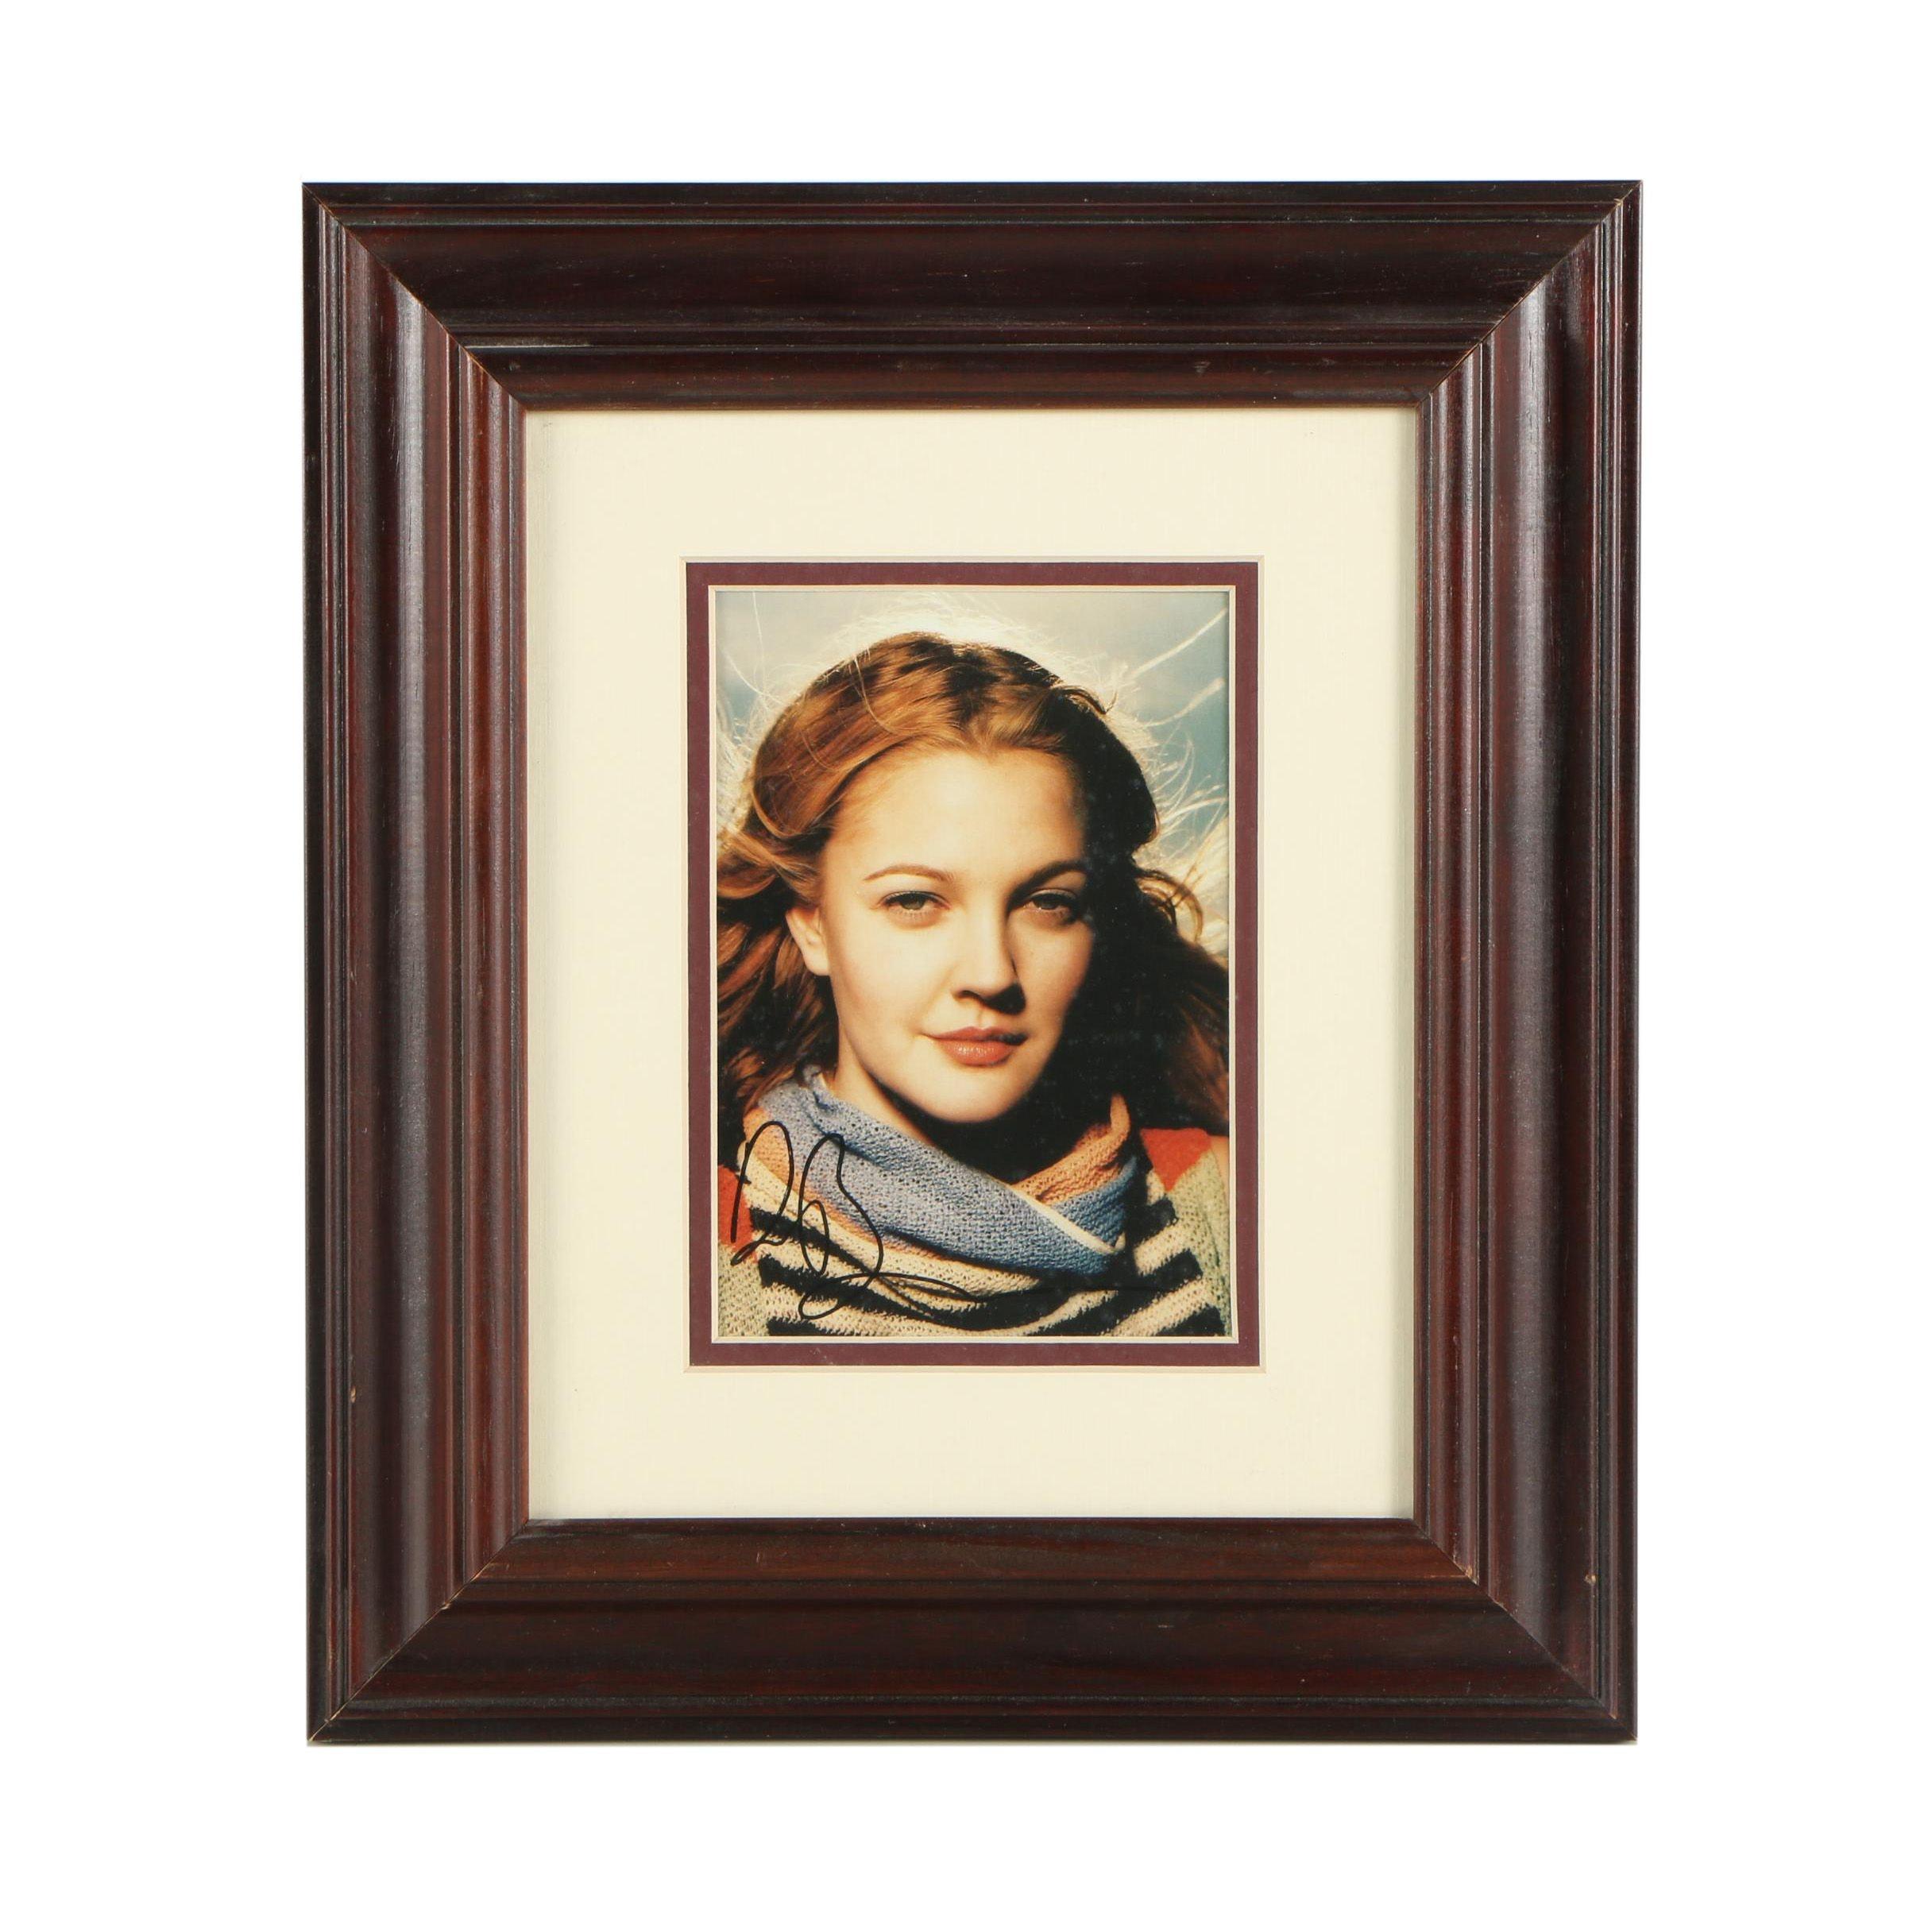 Drew Barrymore Autographed Photograph